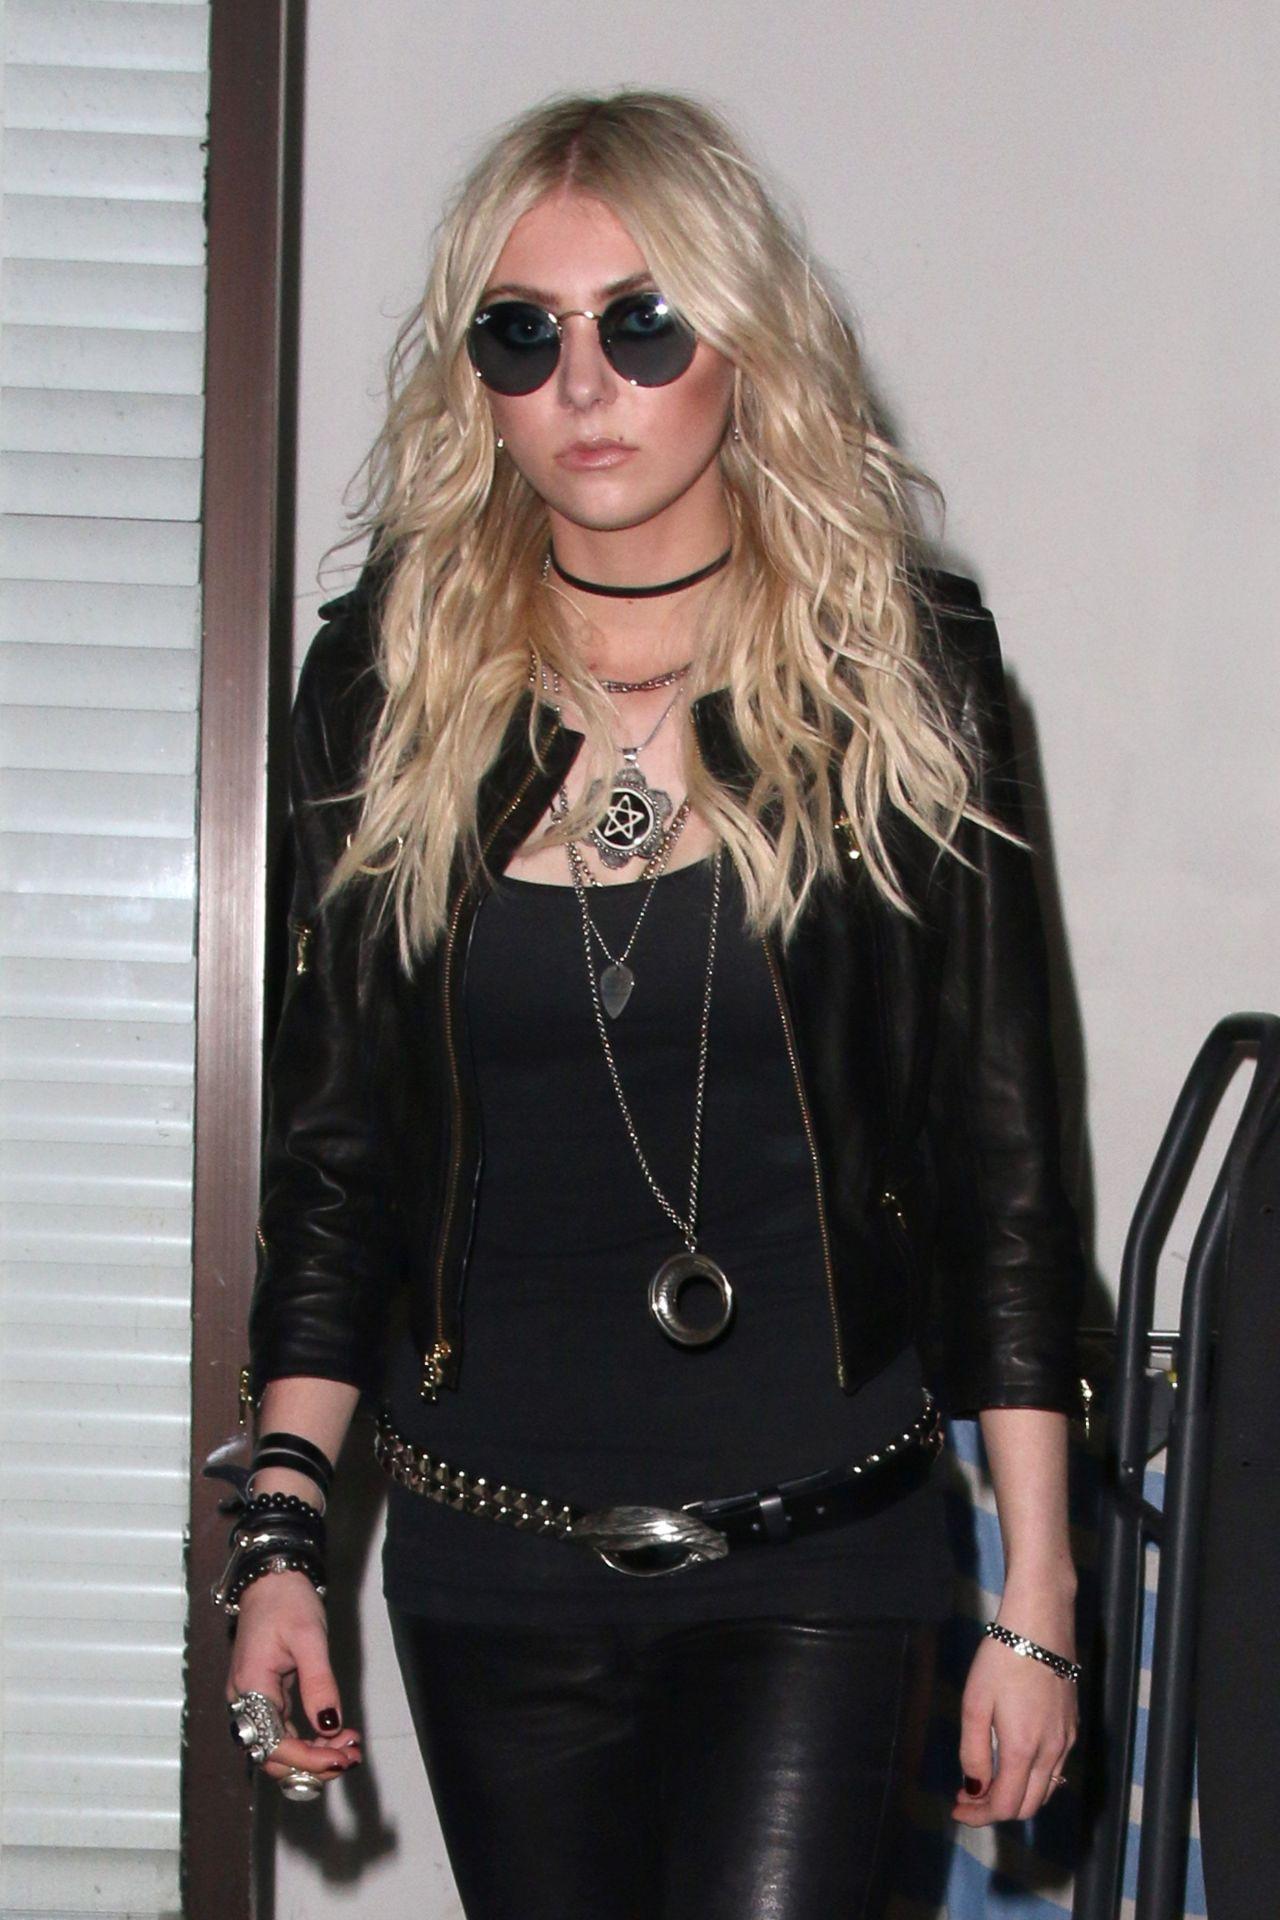 Taylor Momsen Night Out Style Leaving Warwick Nightclub